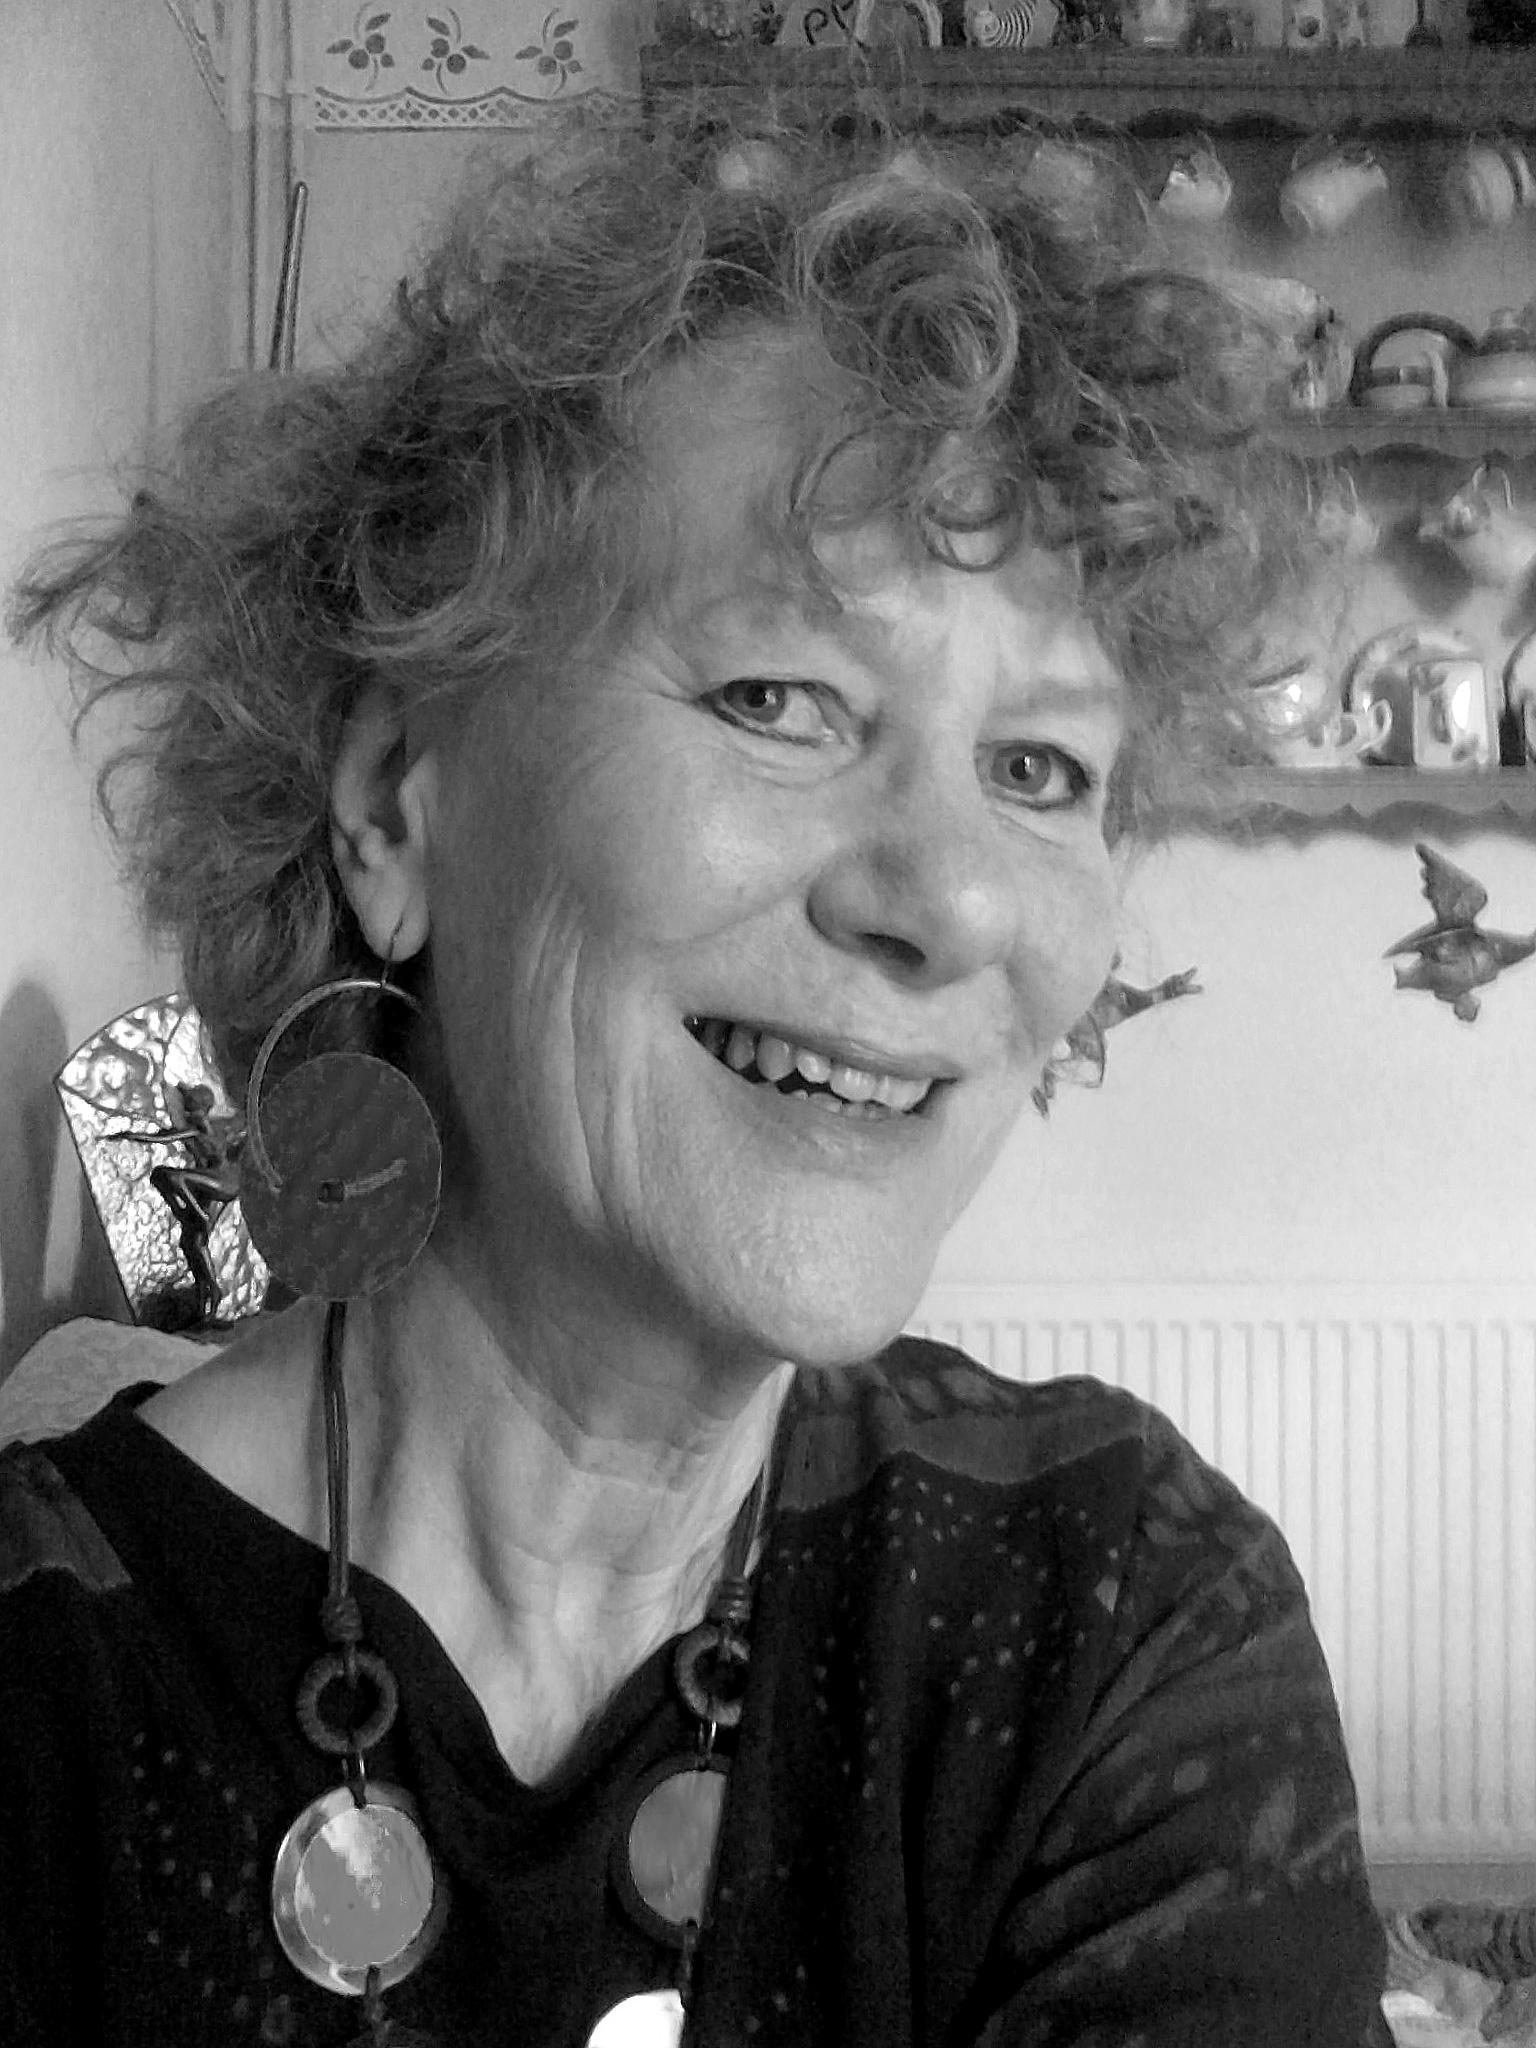 Author, Carolyn Belcher